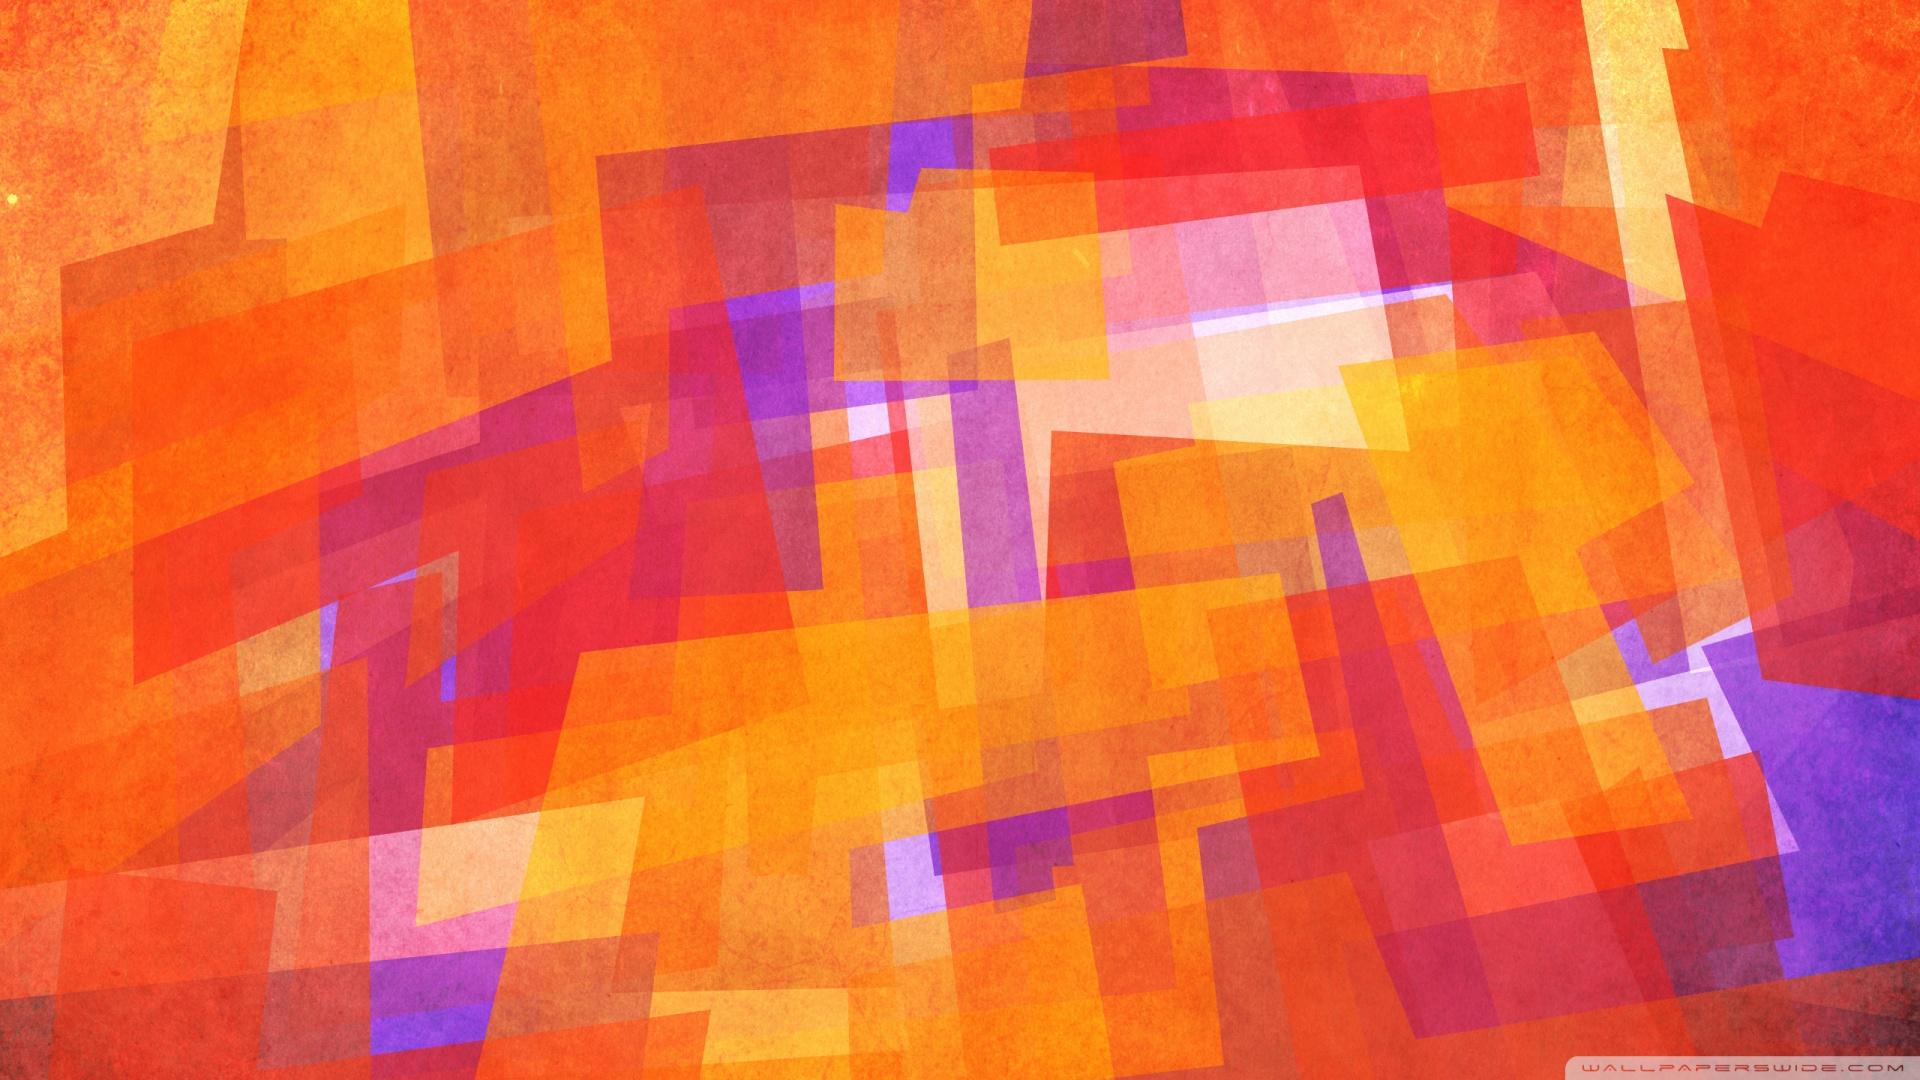 Best 39 Geometric Desktop Backgrounds on HipWallpaper Beautiful 1920x1080